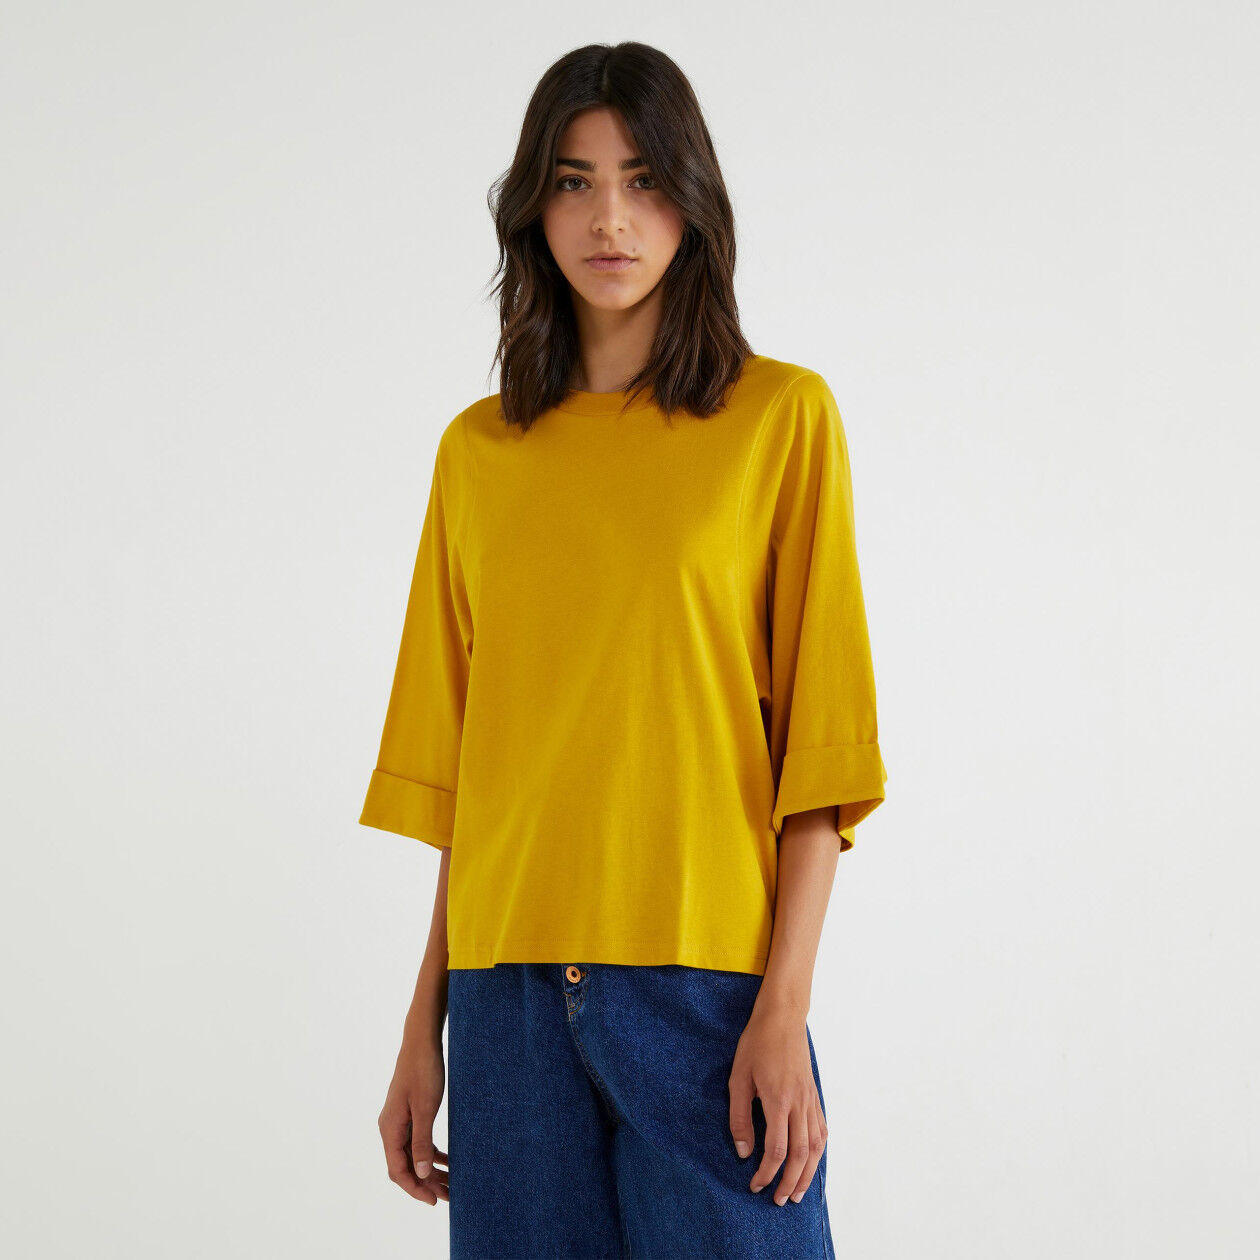 T-shirt απαλό